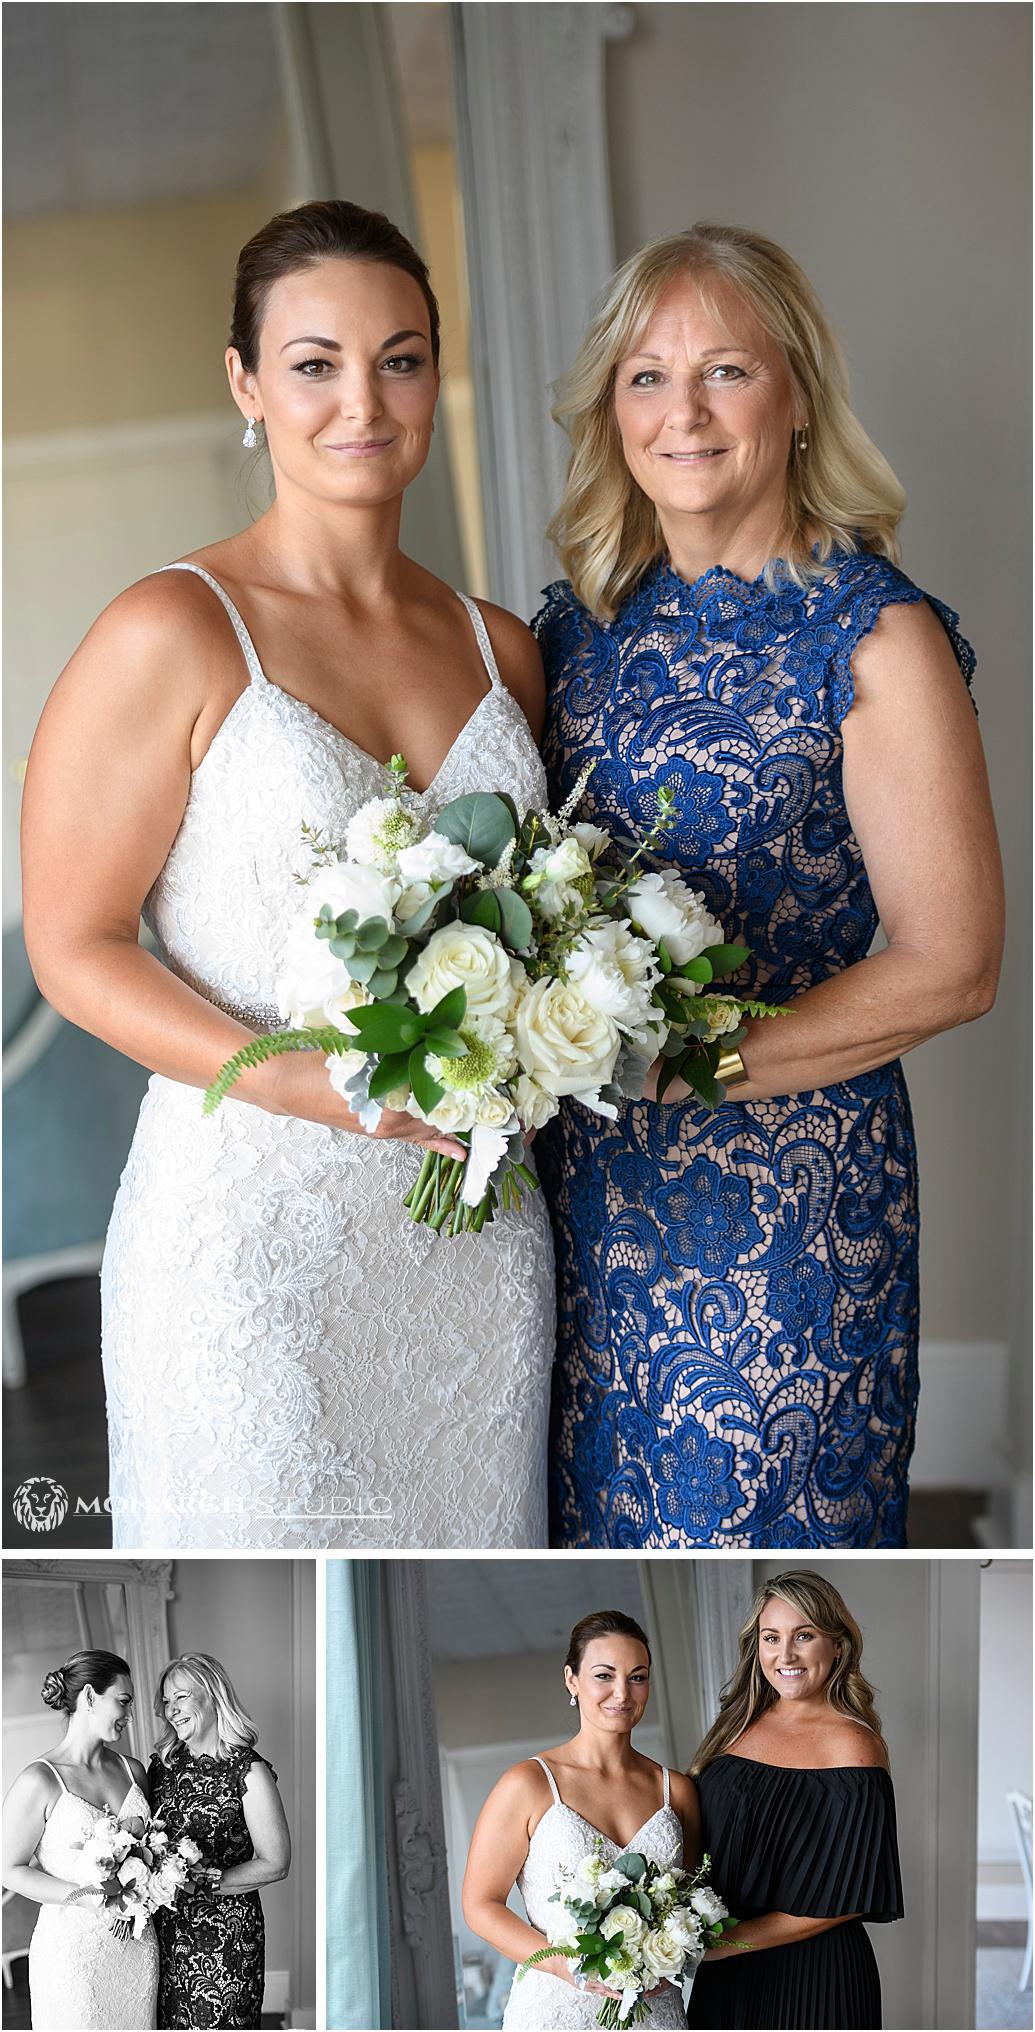 037-whiteroom-wedding-photographer-2019-05-22_0019.jpg